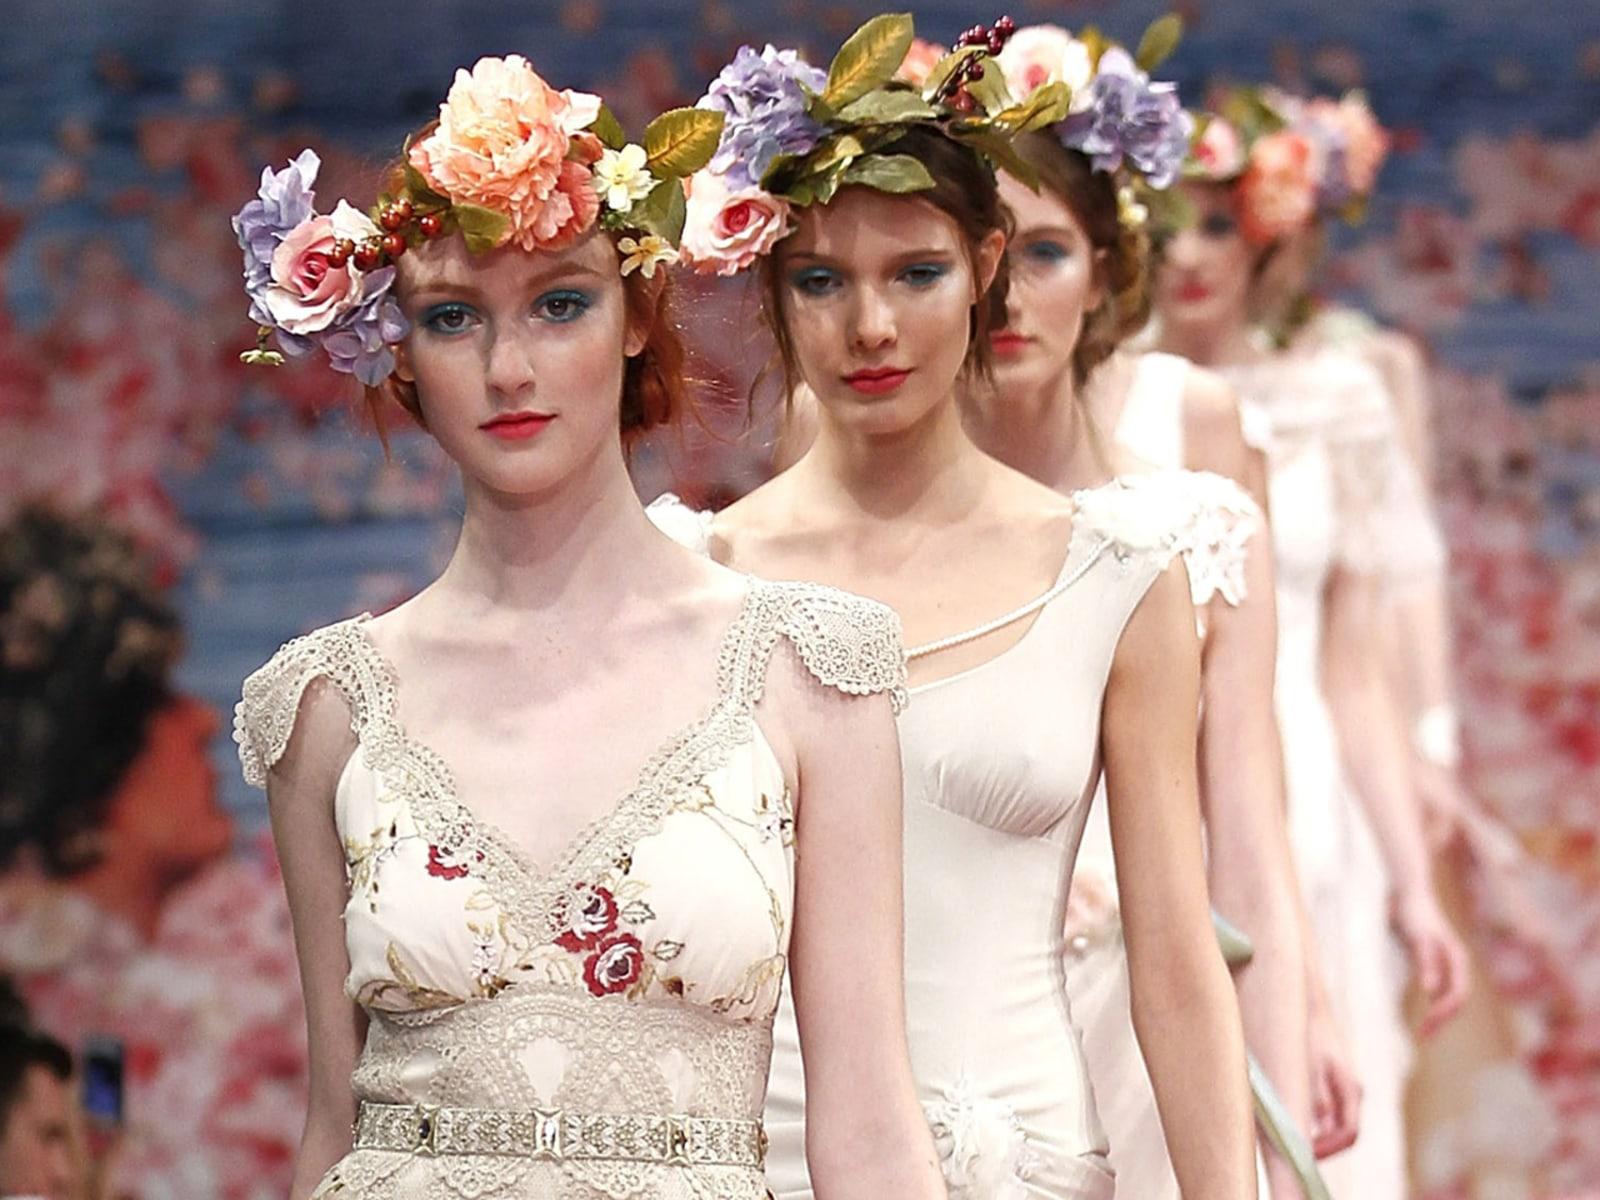 Image: 2013 Bridal Collection - Claire Pettibone - Show